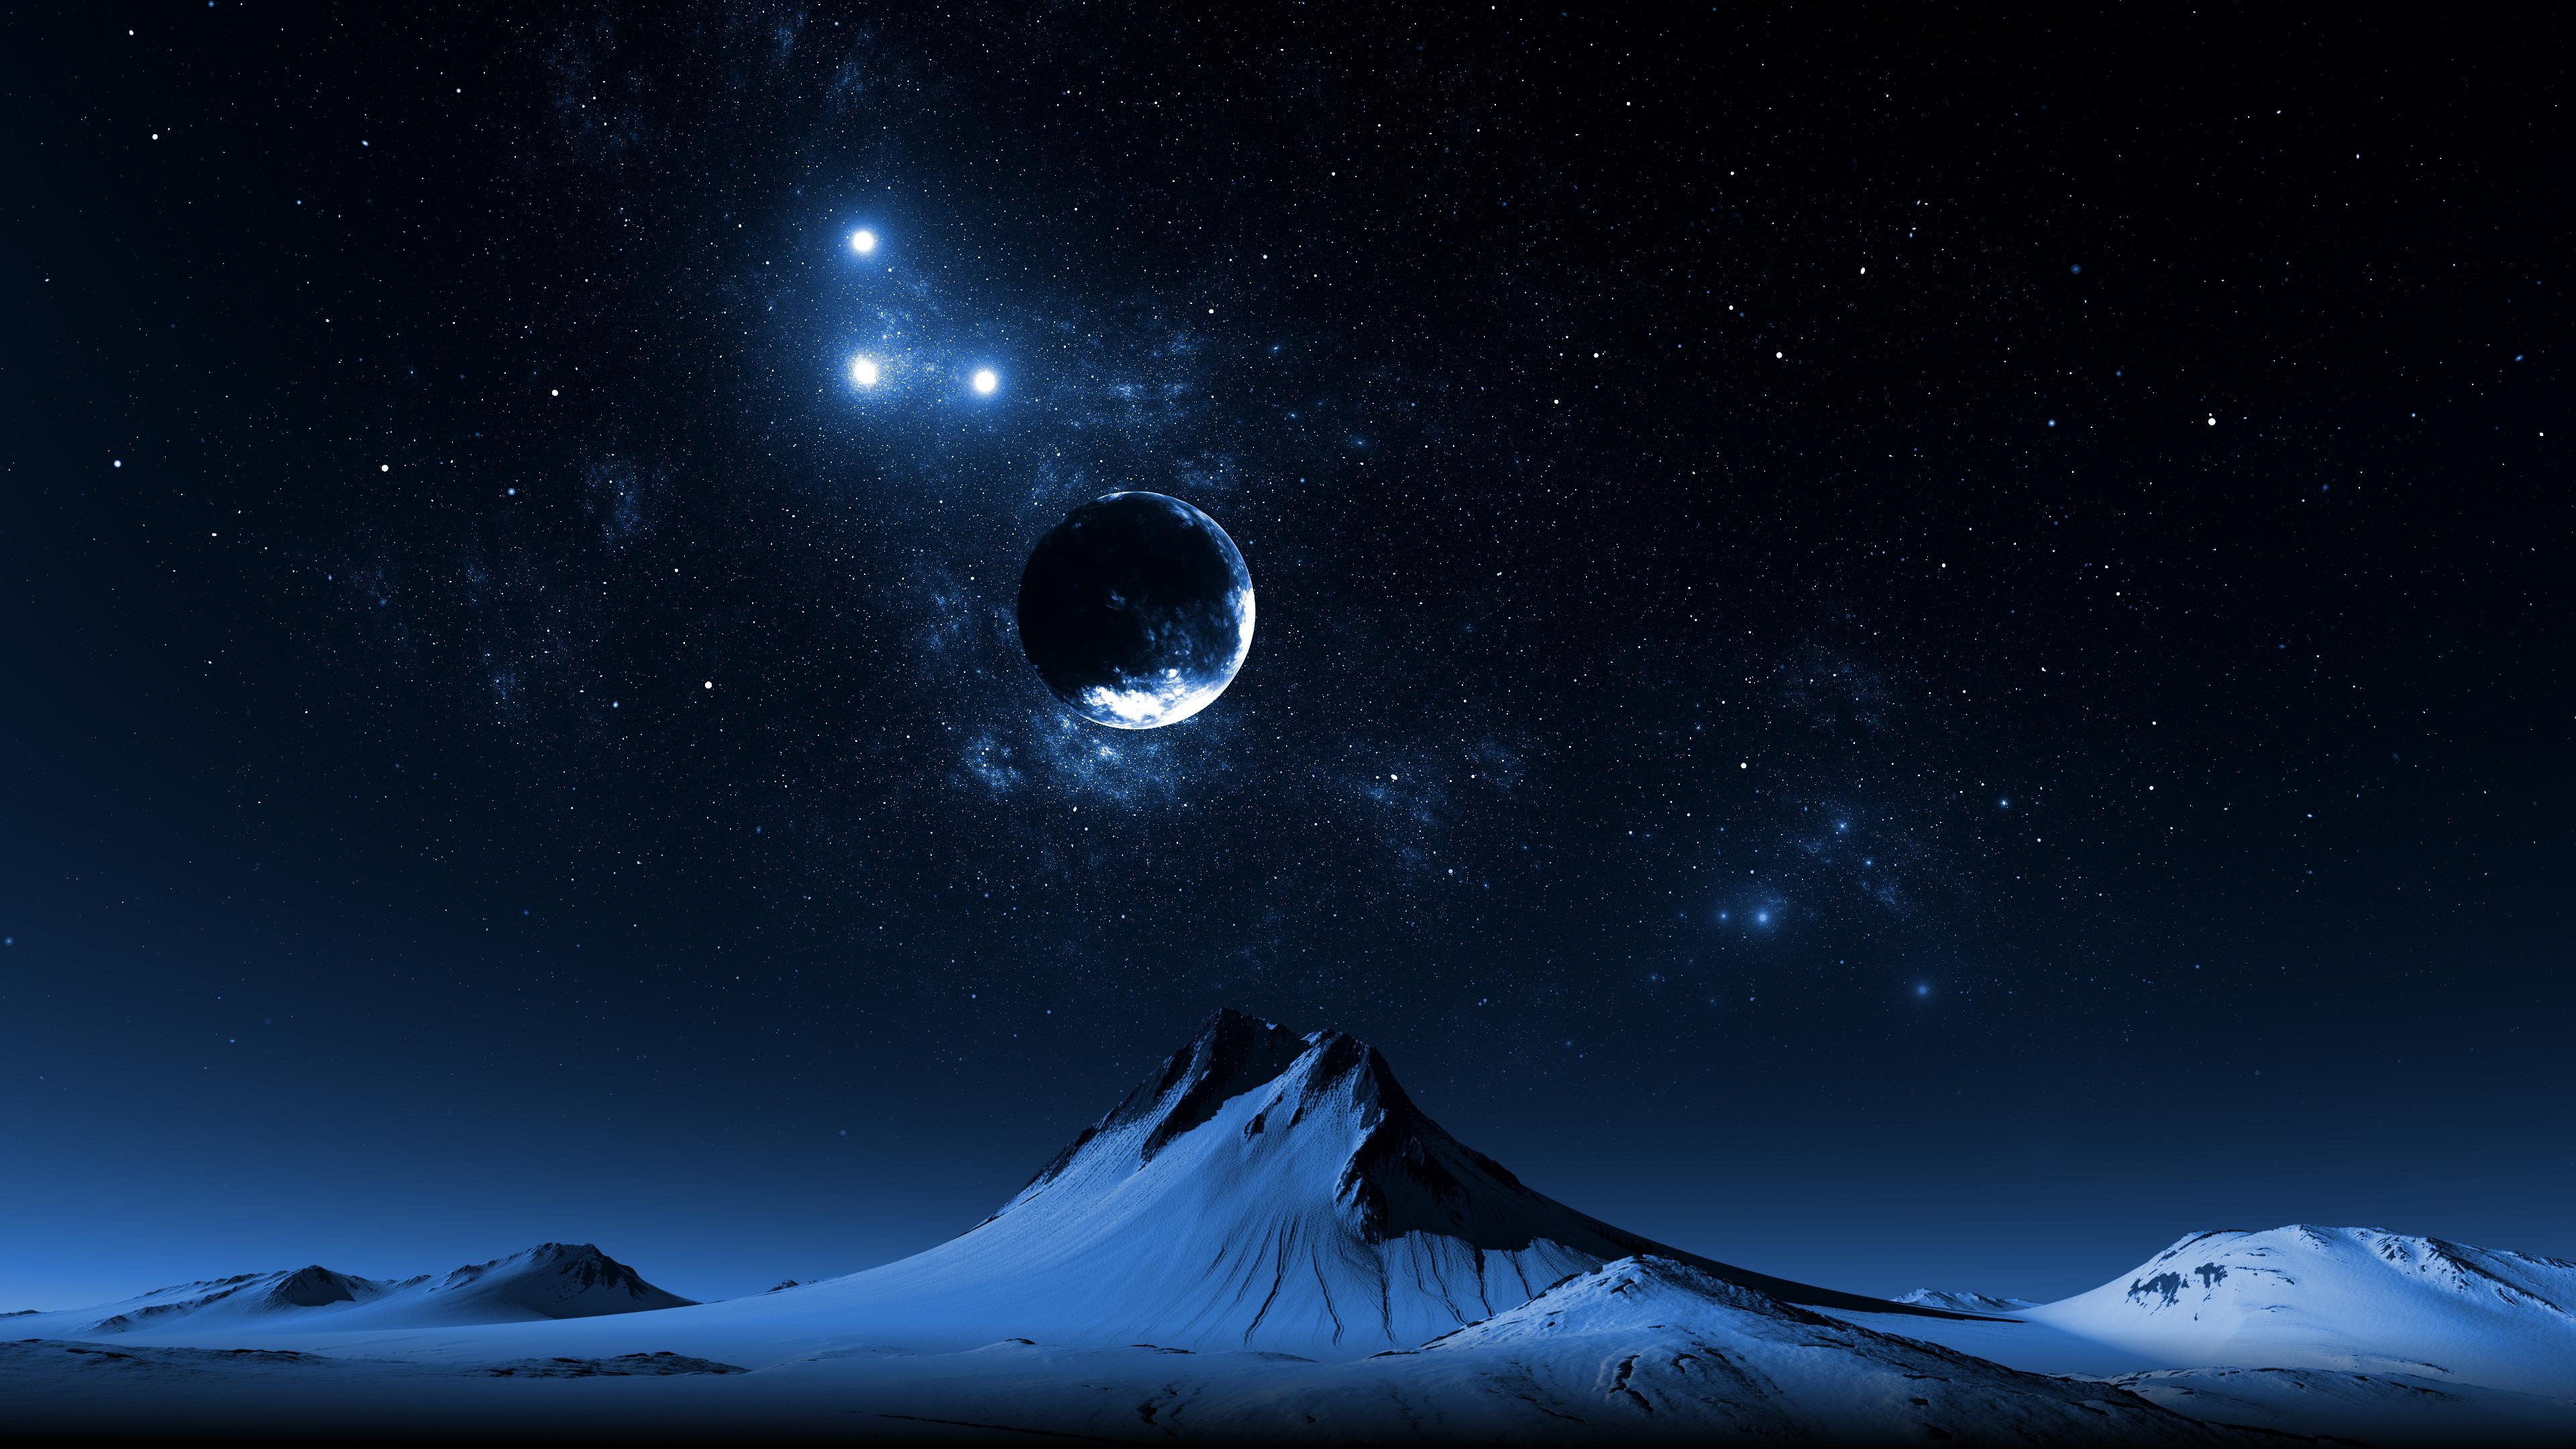 hypnoshot polaris moon 1578255153 - Hypnoshot Polaris Moon -